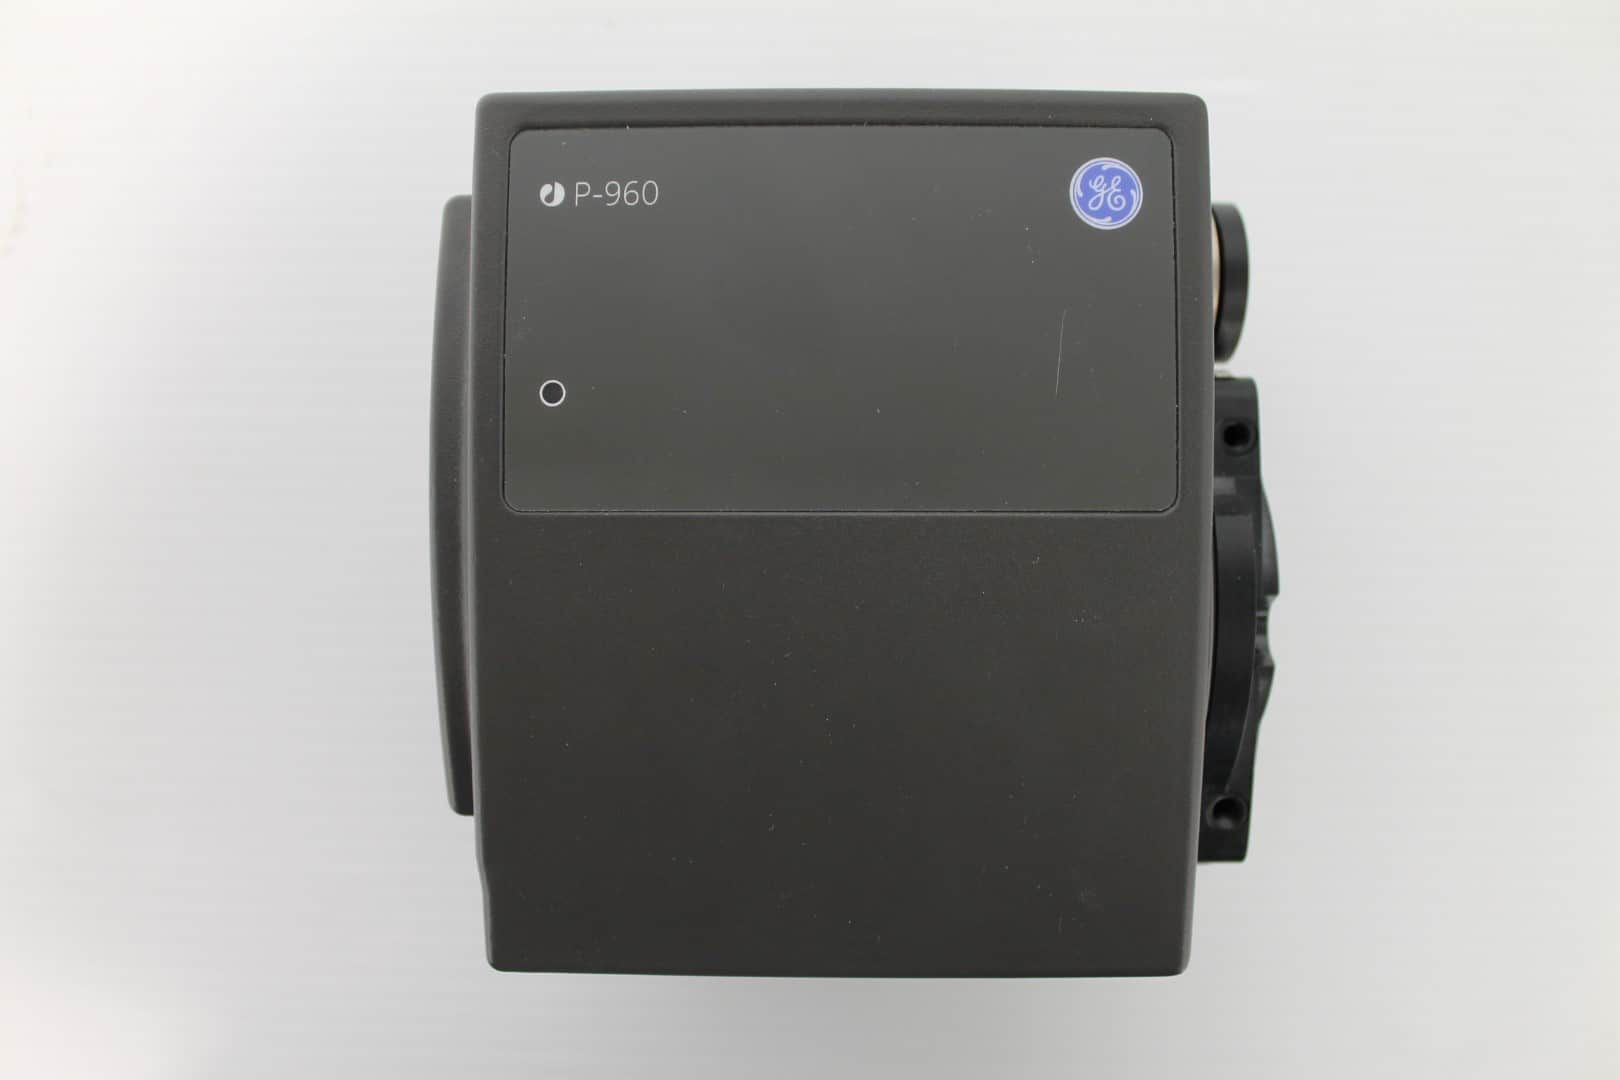 GE Healthcare P-960 Sample Pump AKTA FPLC Chromatography 18672700 2.0MPa Unit5